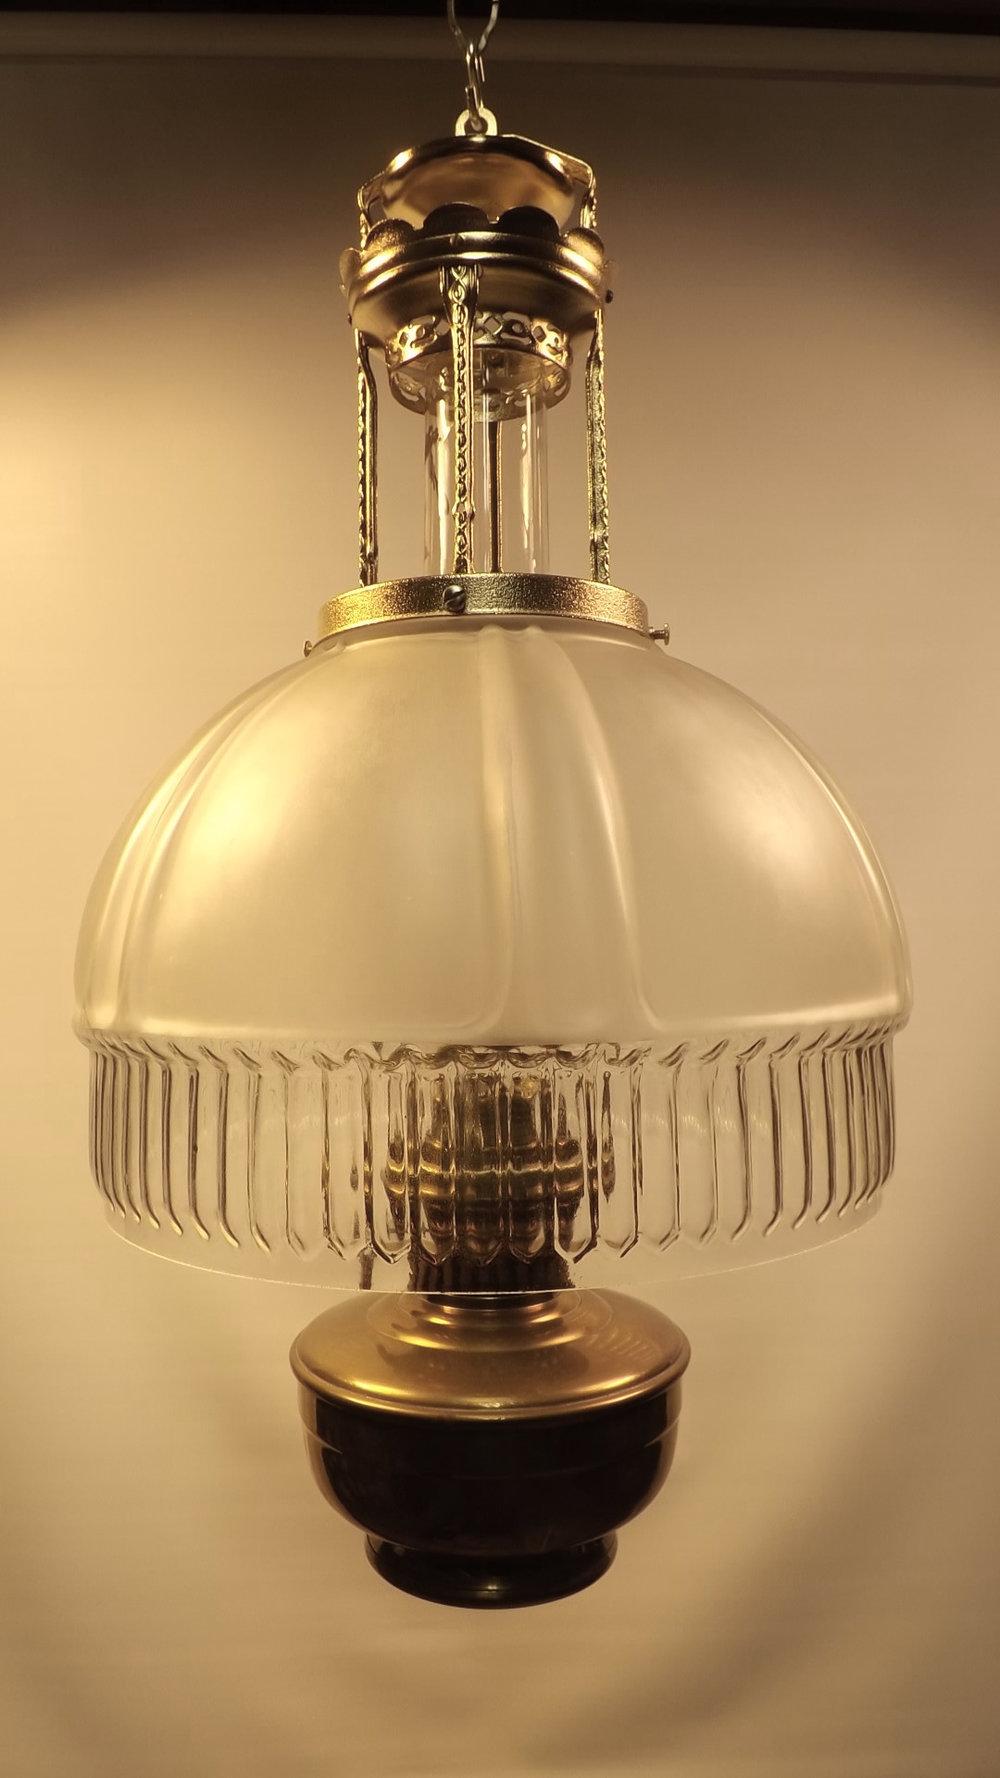 Antique Hanging Lamps Antique Kerosene Lighting